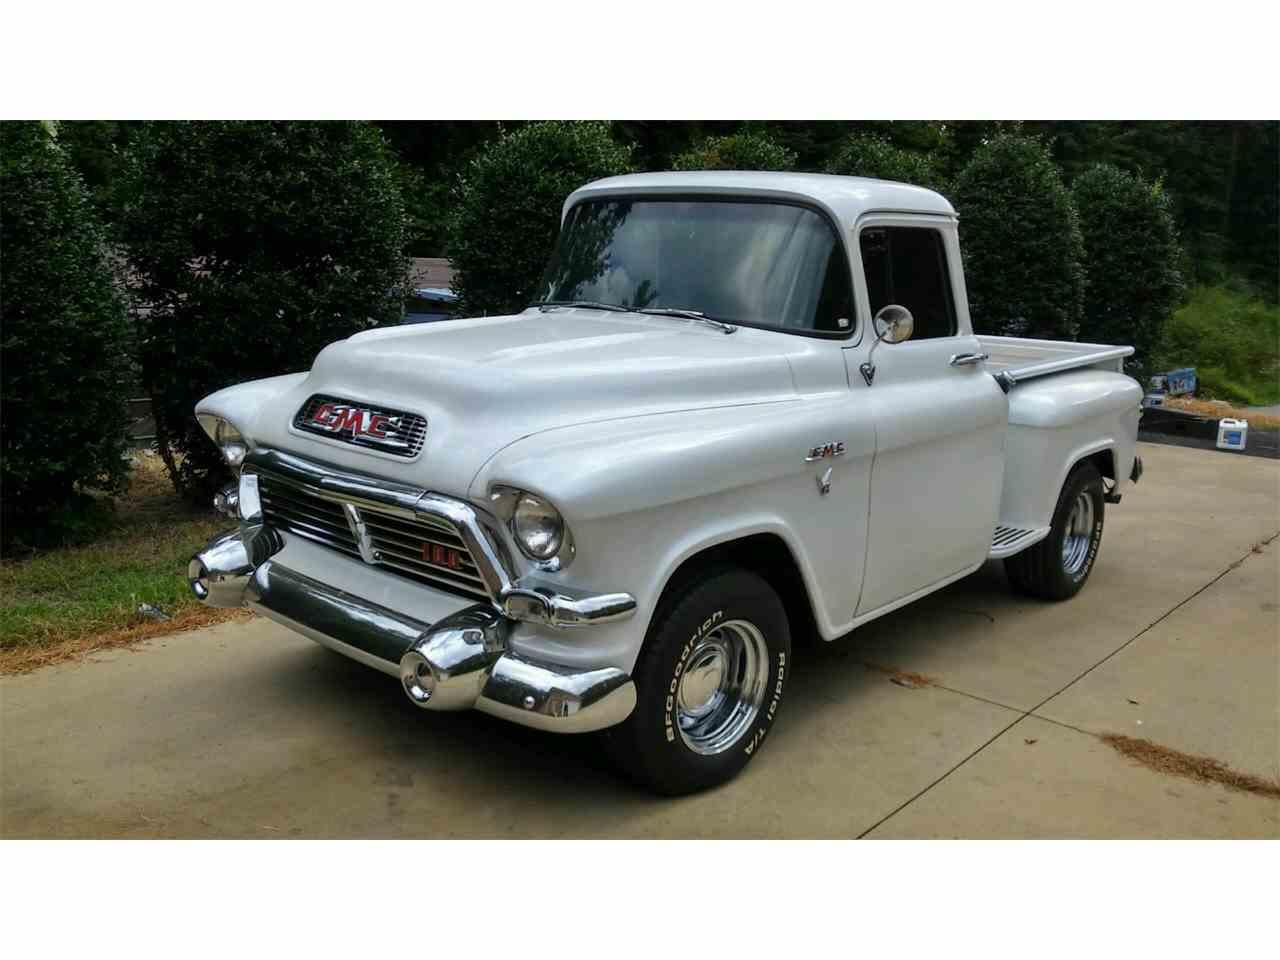 1957 gmc truck for sale cc 909186. Black Bedroom Furniture Sets. Home Design Ideas